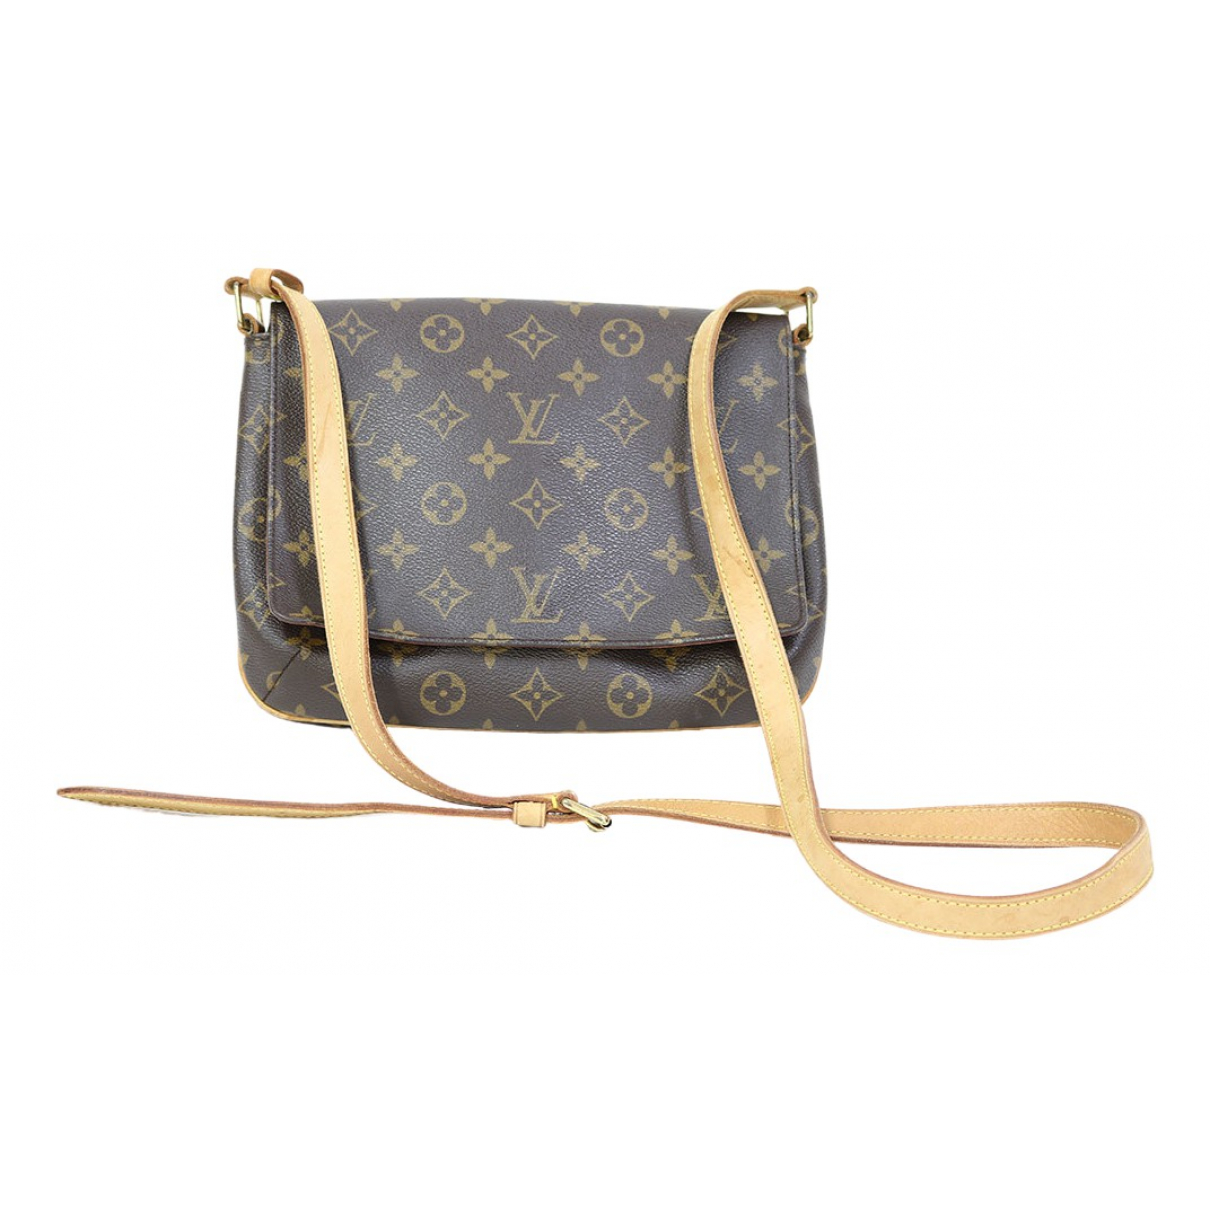 Bolso  Musette Tango  de Lona Louis Vuitton